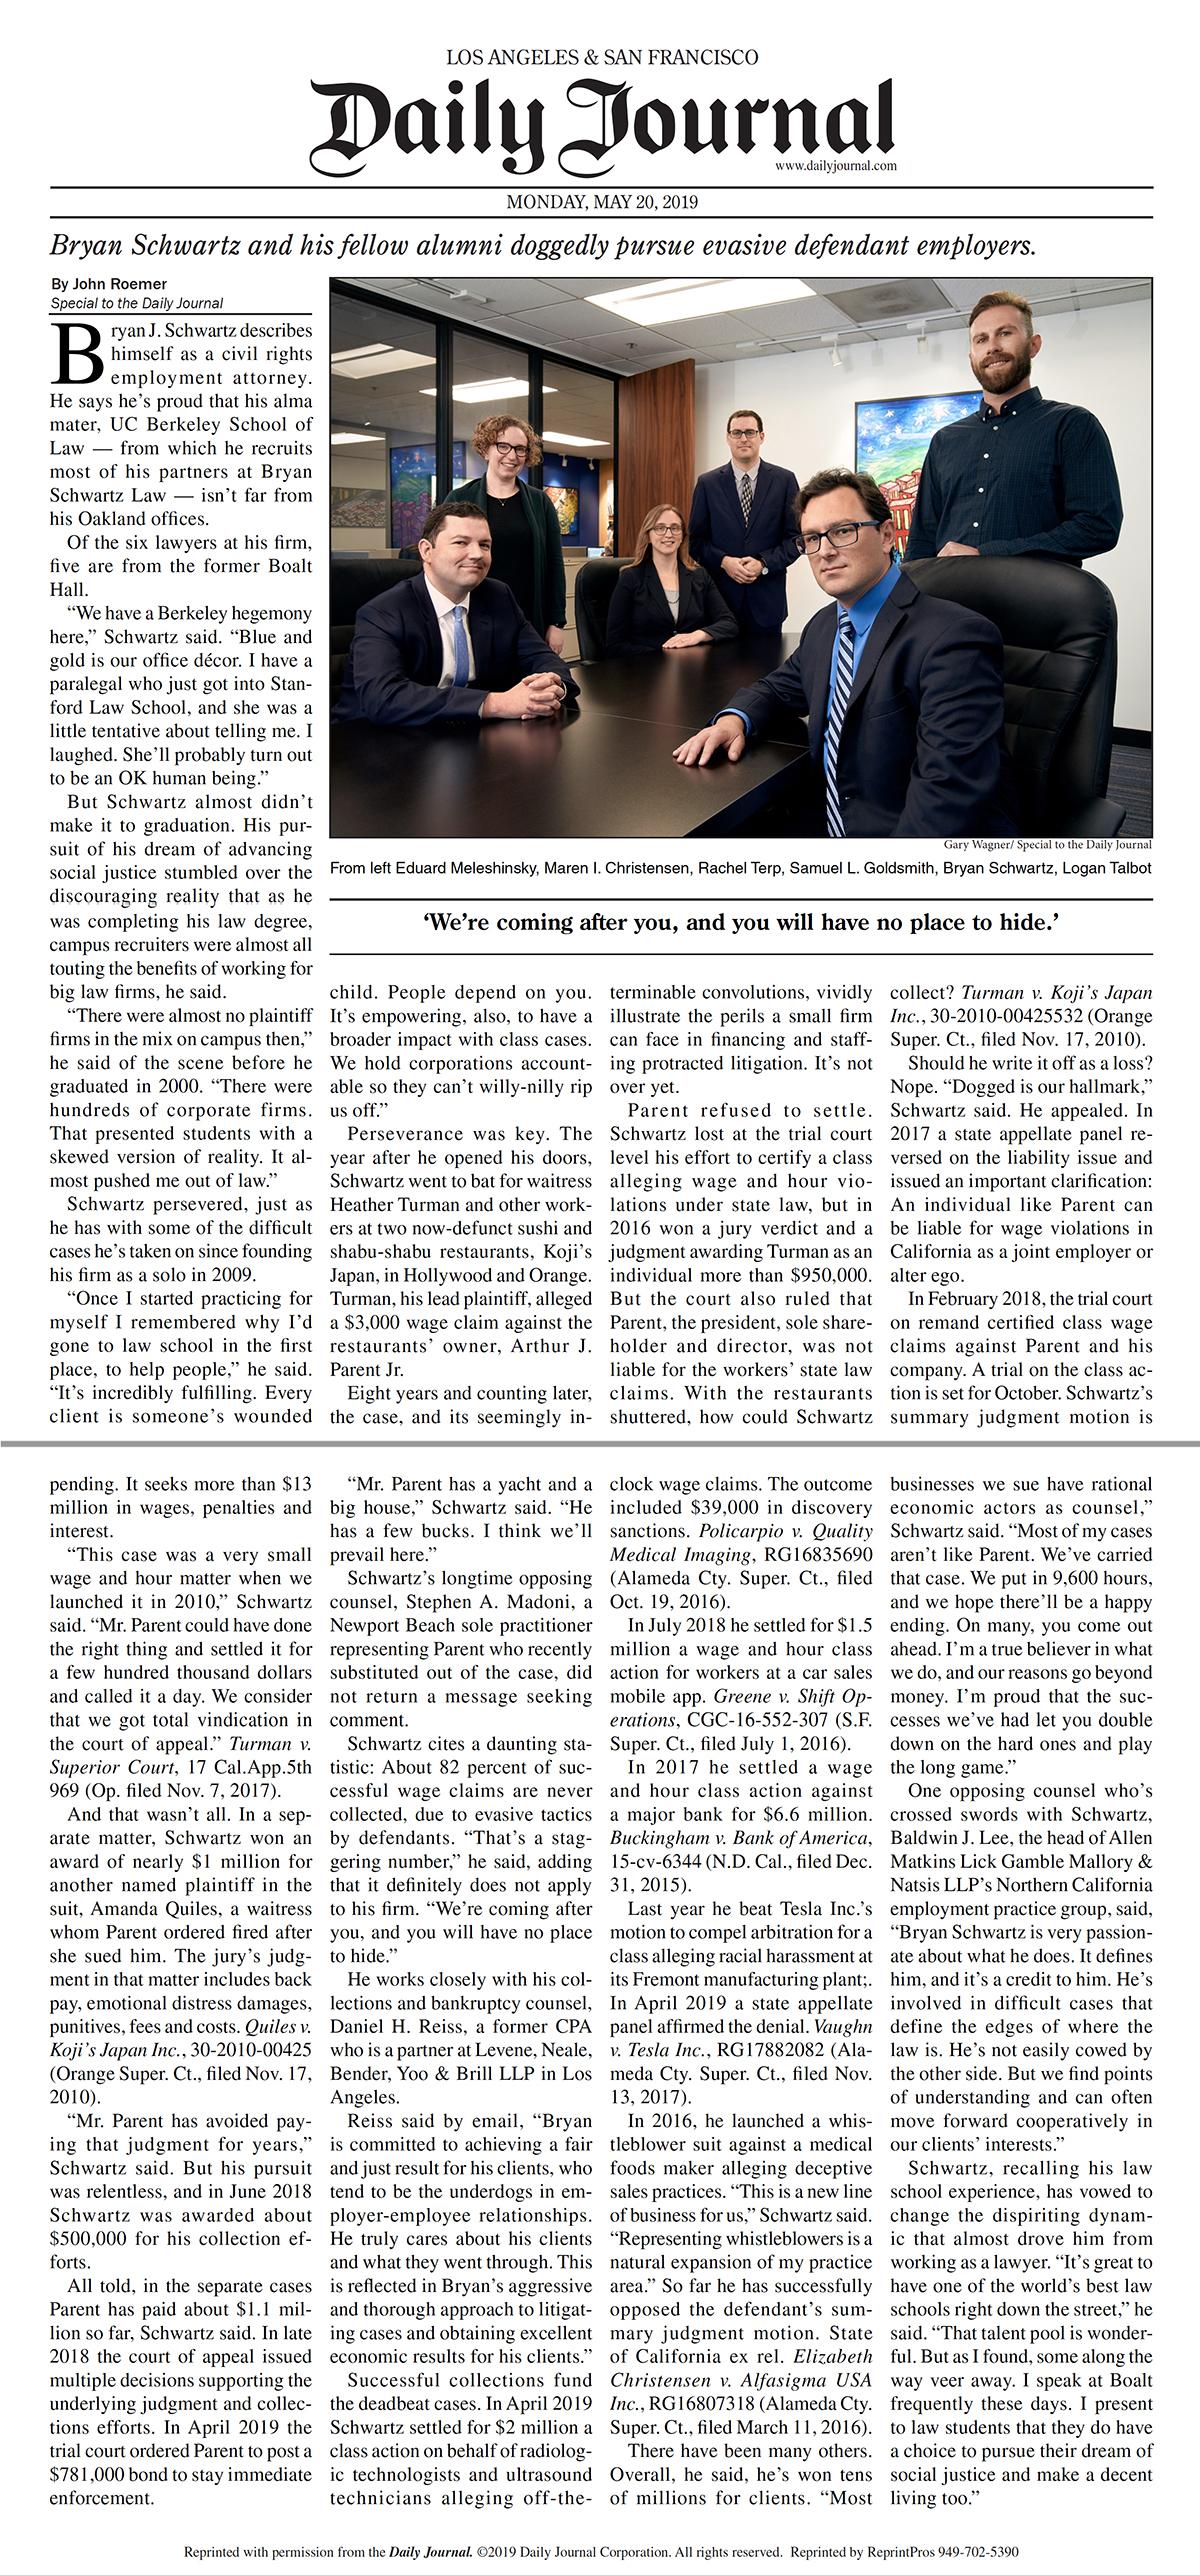 DailyJourna-05-13-19.jpg